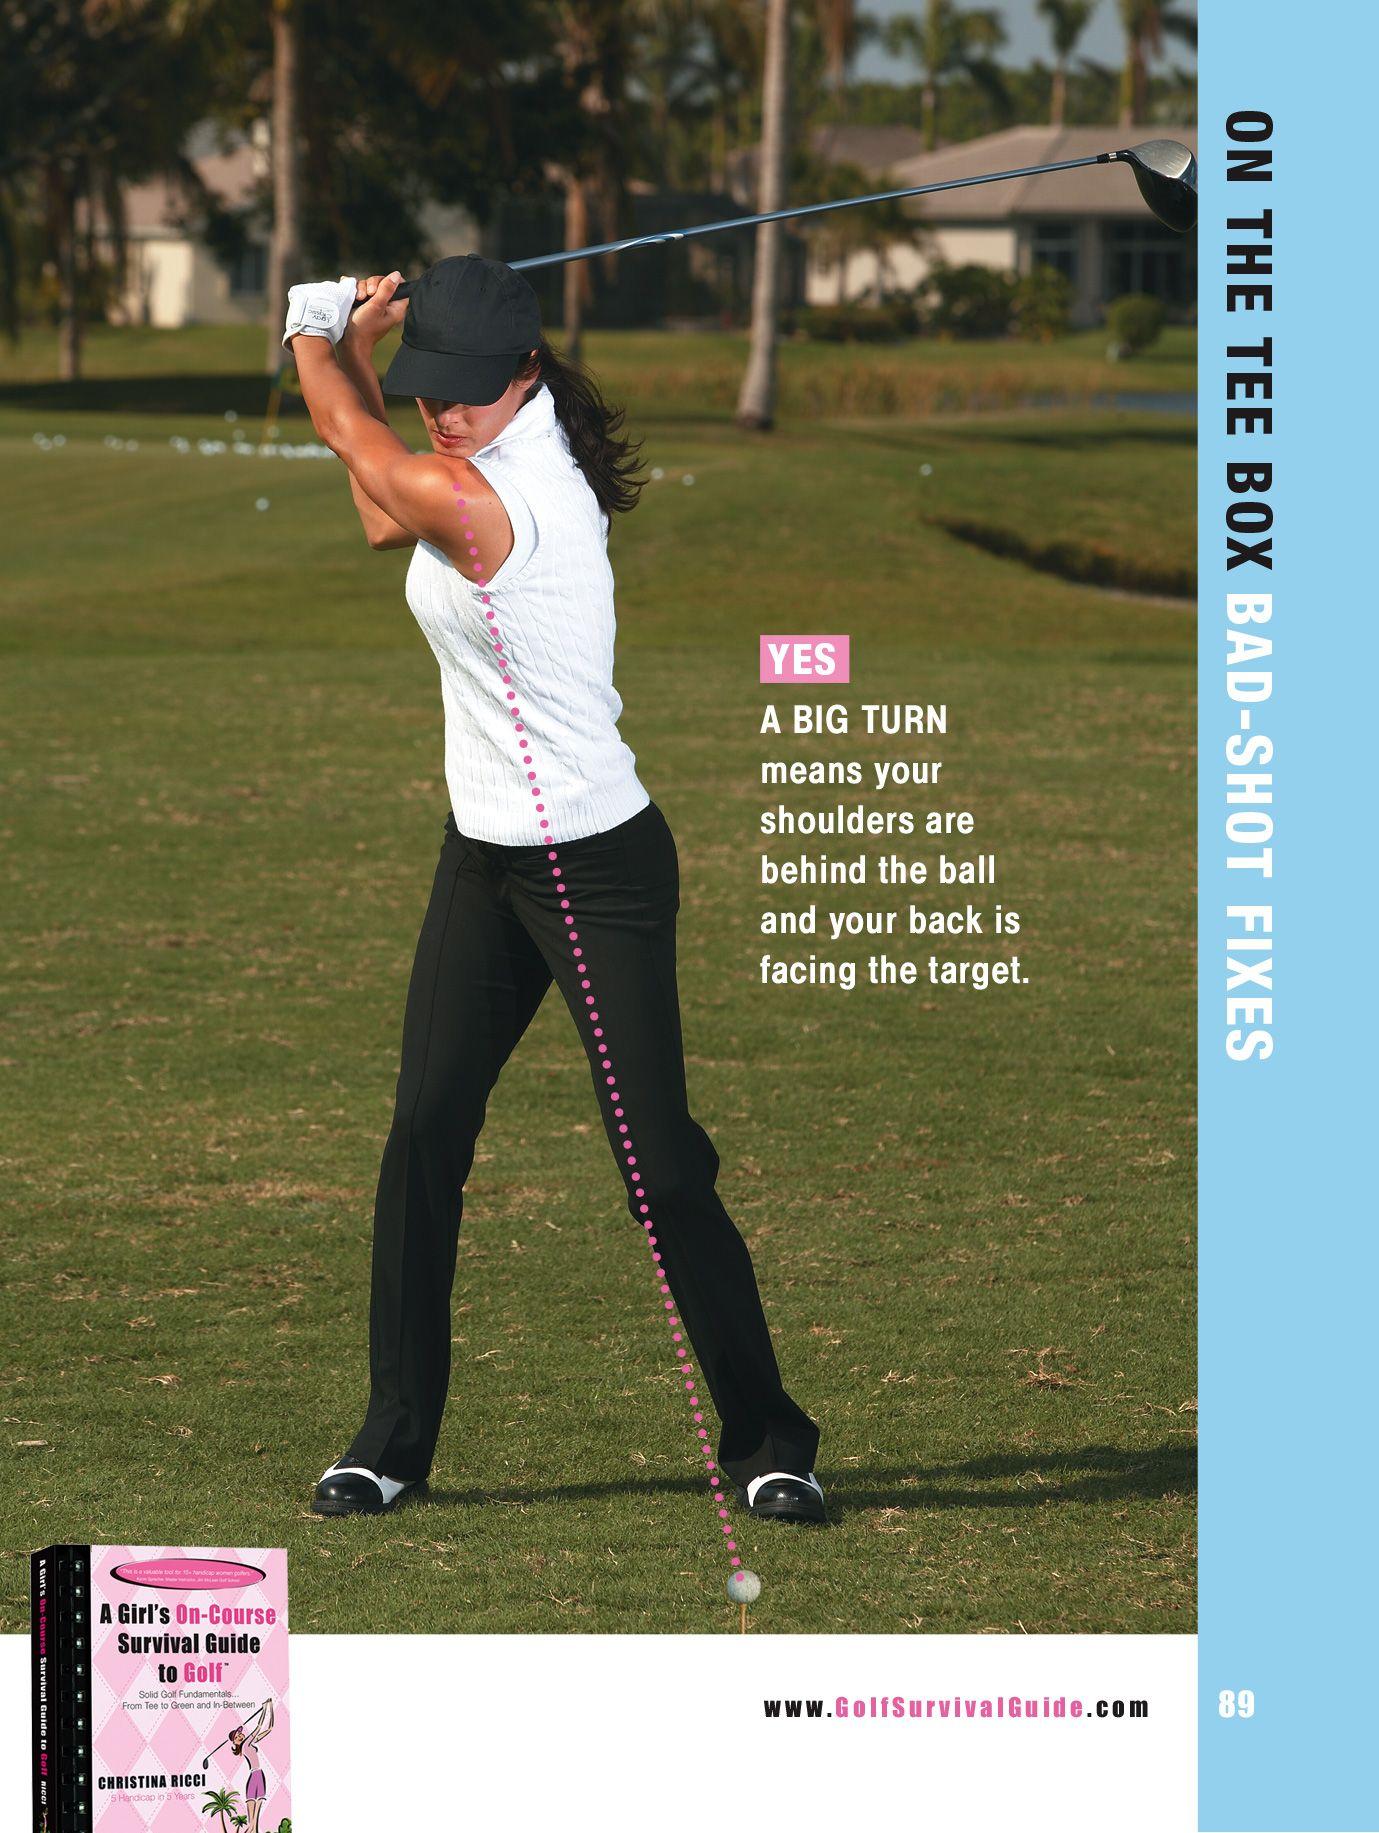 29+ Charles barkley golf swing hank haney ideas